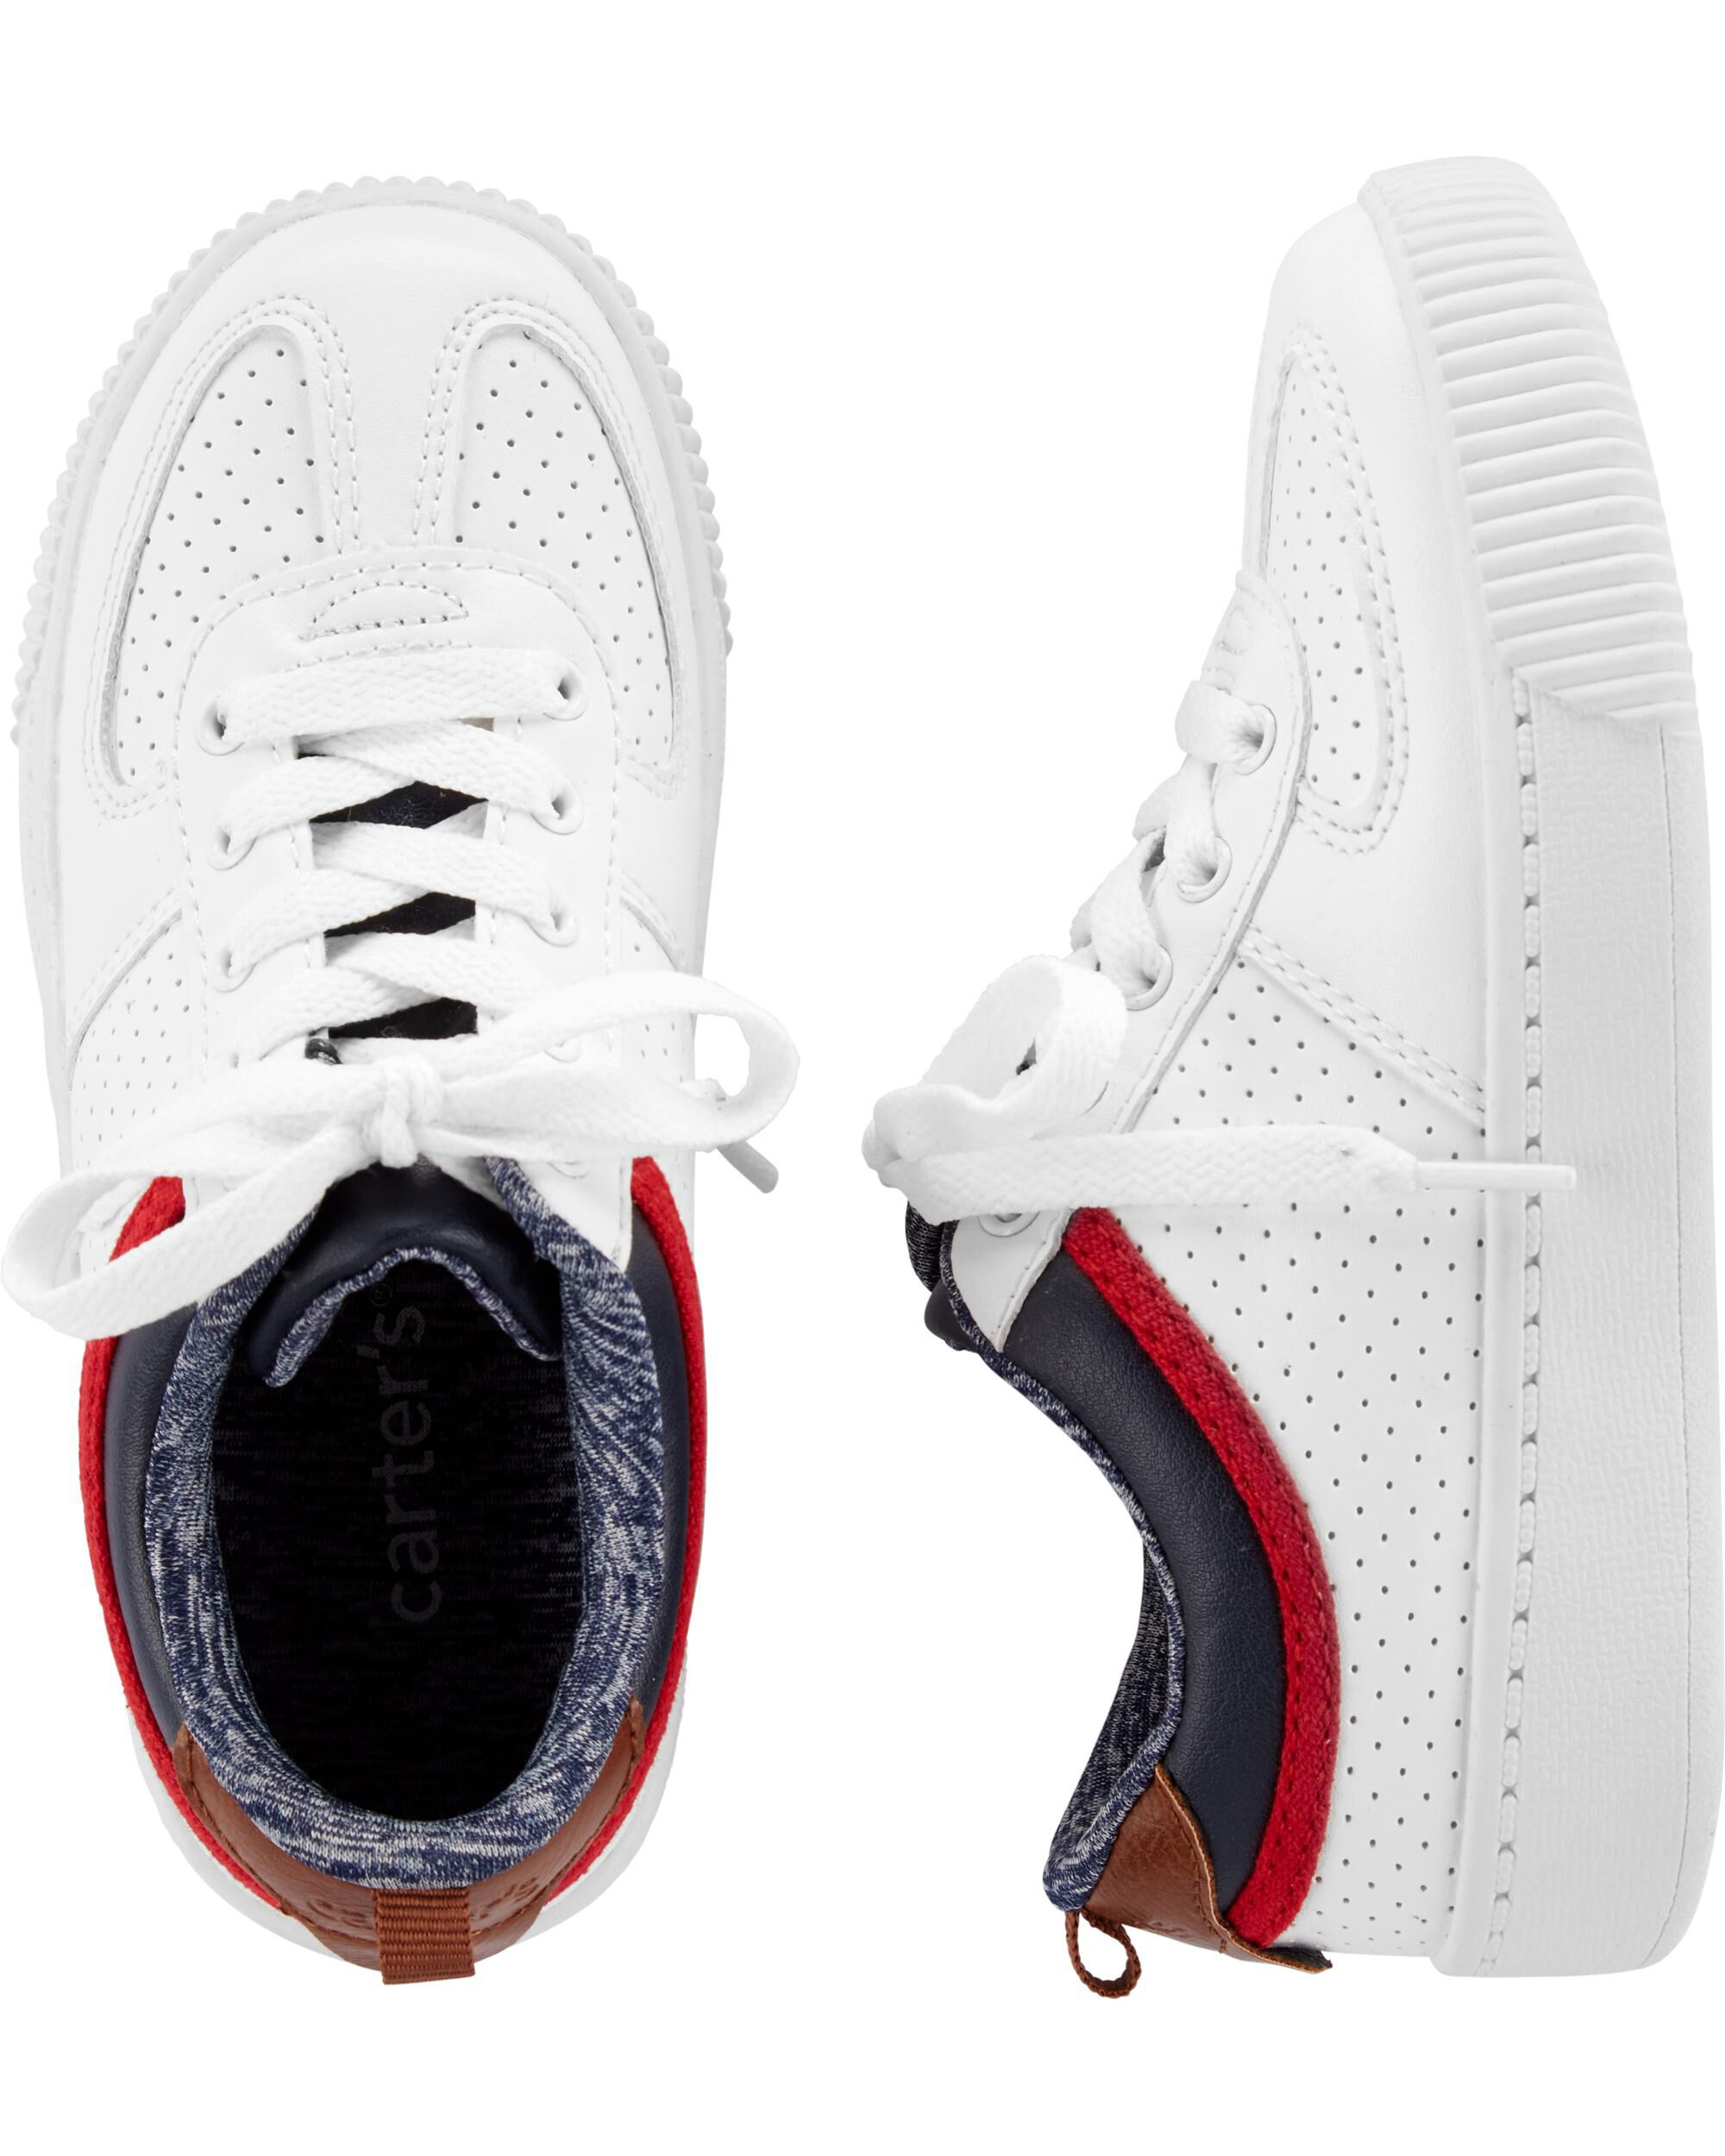 Carter's Casual Sneakers   carters.com